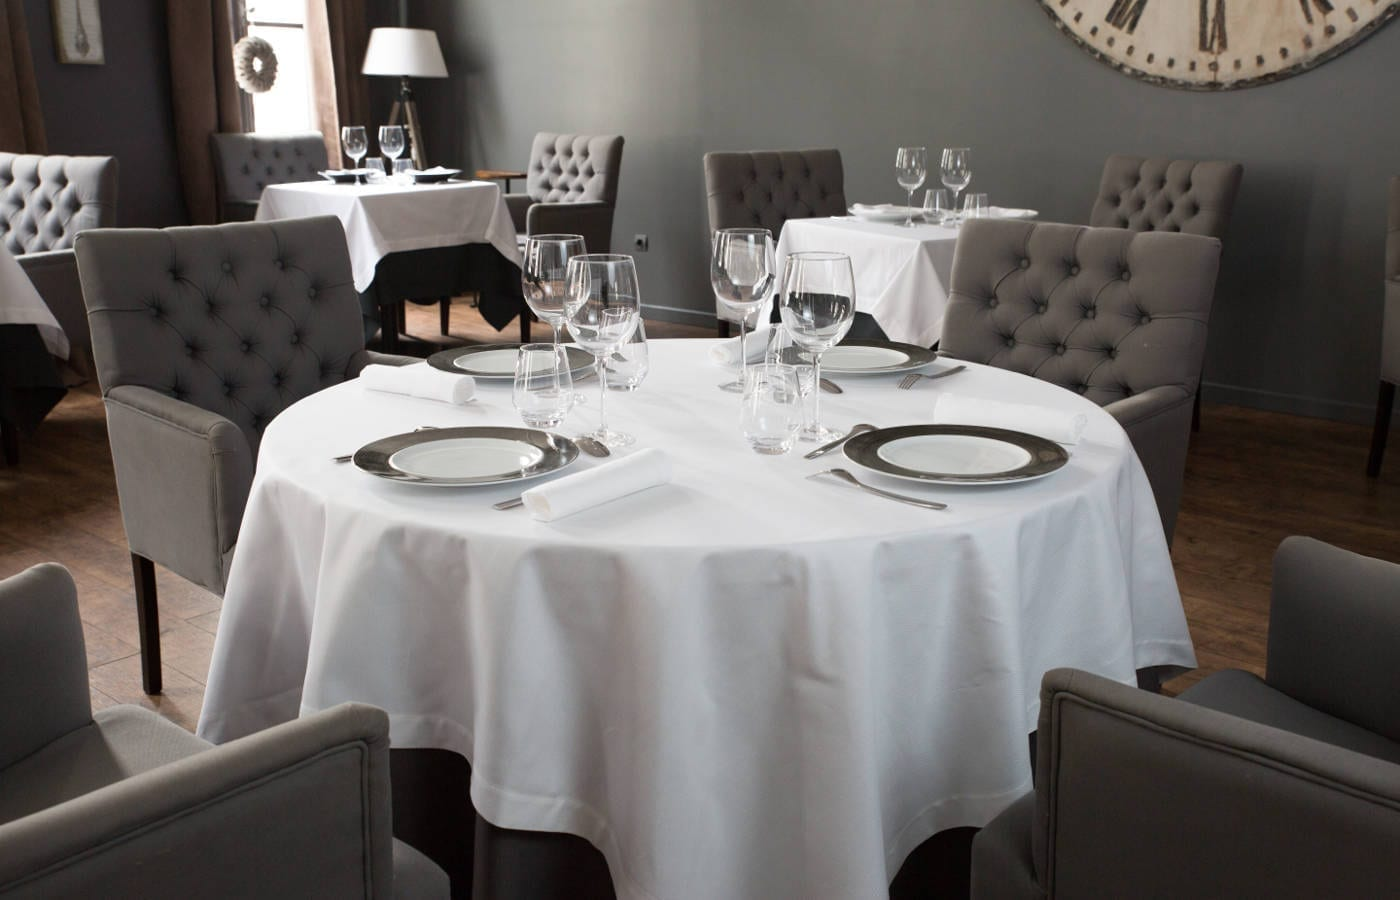 Bergan - Linge de table restaurant